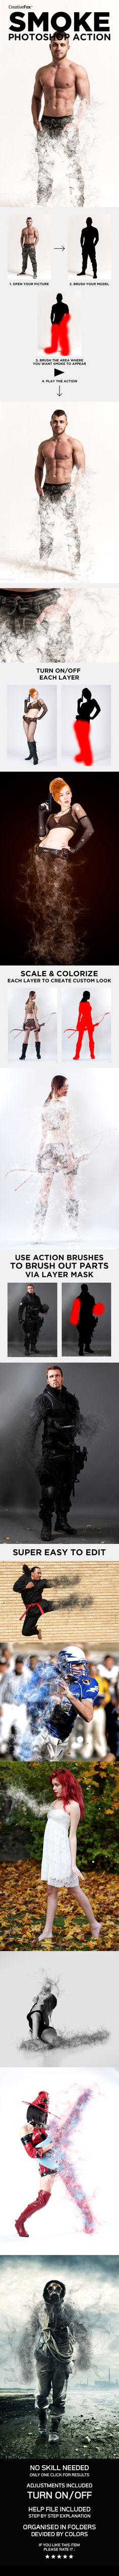 Smoke Photoshop Action - Smoke Effect Creator Action - Photo Effects Actions